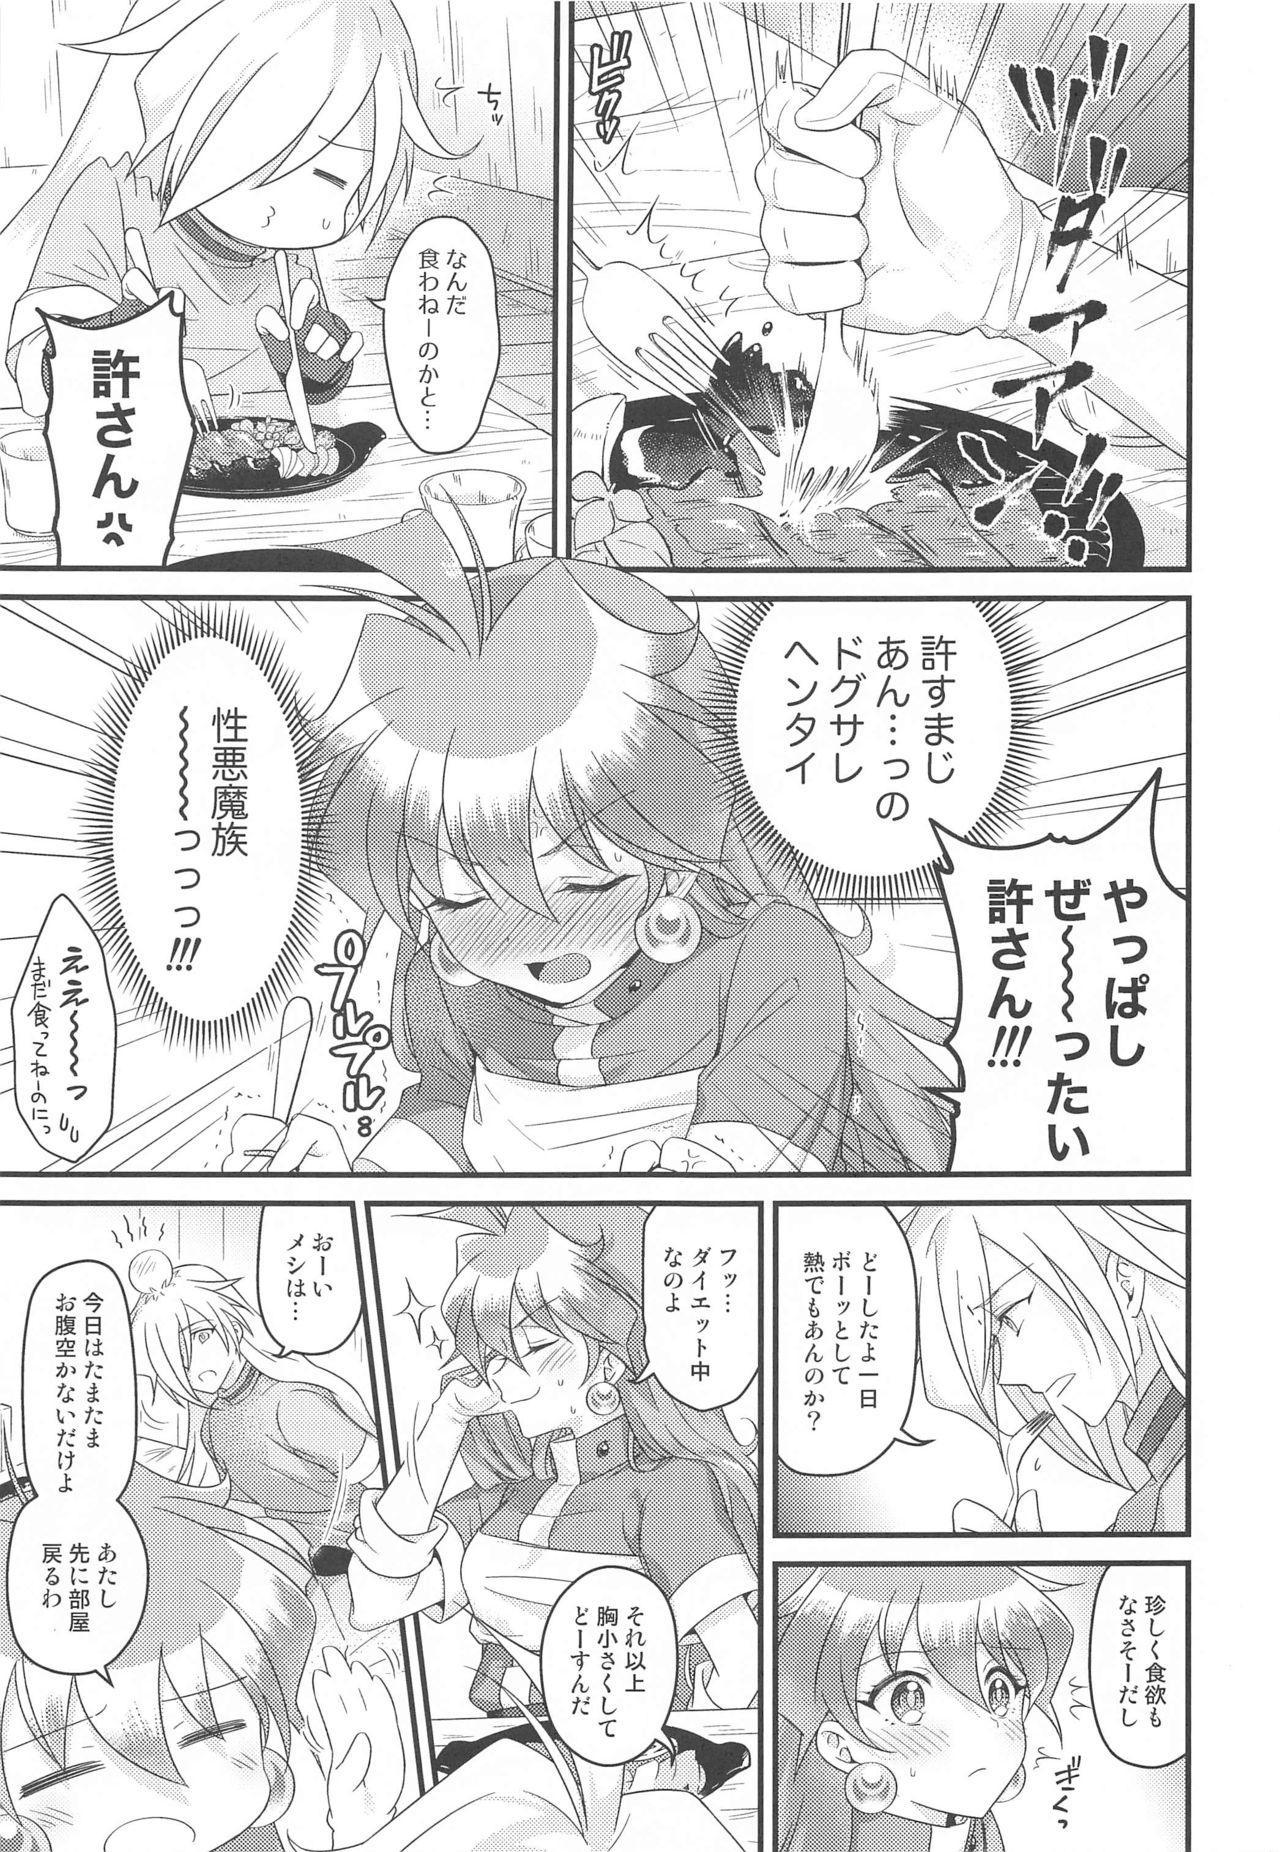 Lina Inverse Juu Shinkan ni NTR Love Love Ochi 3